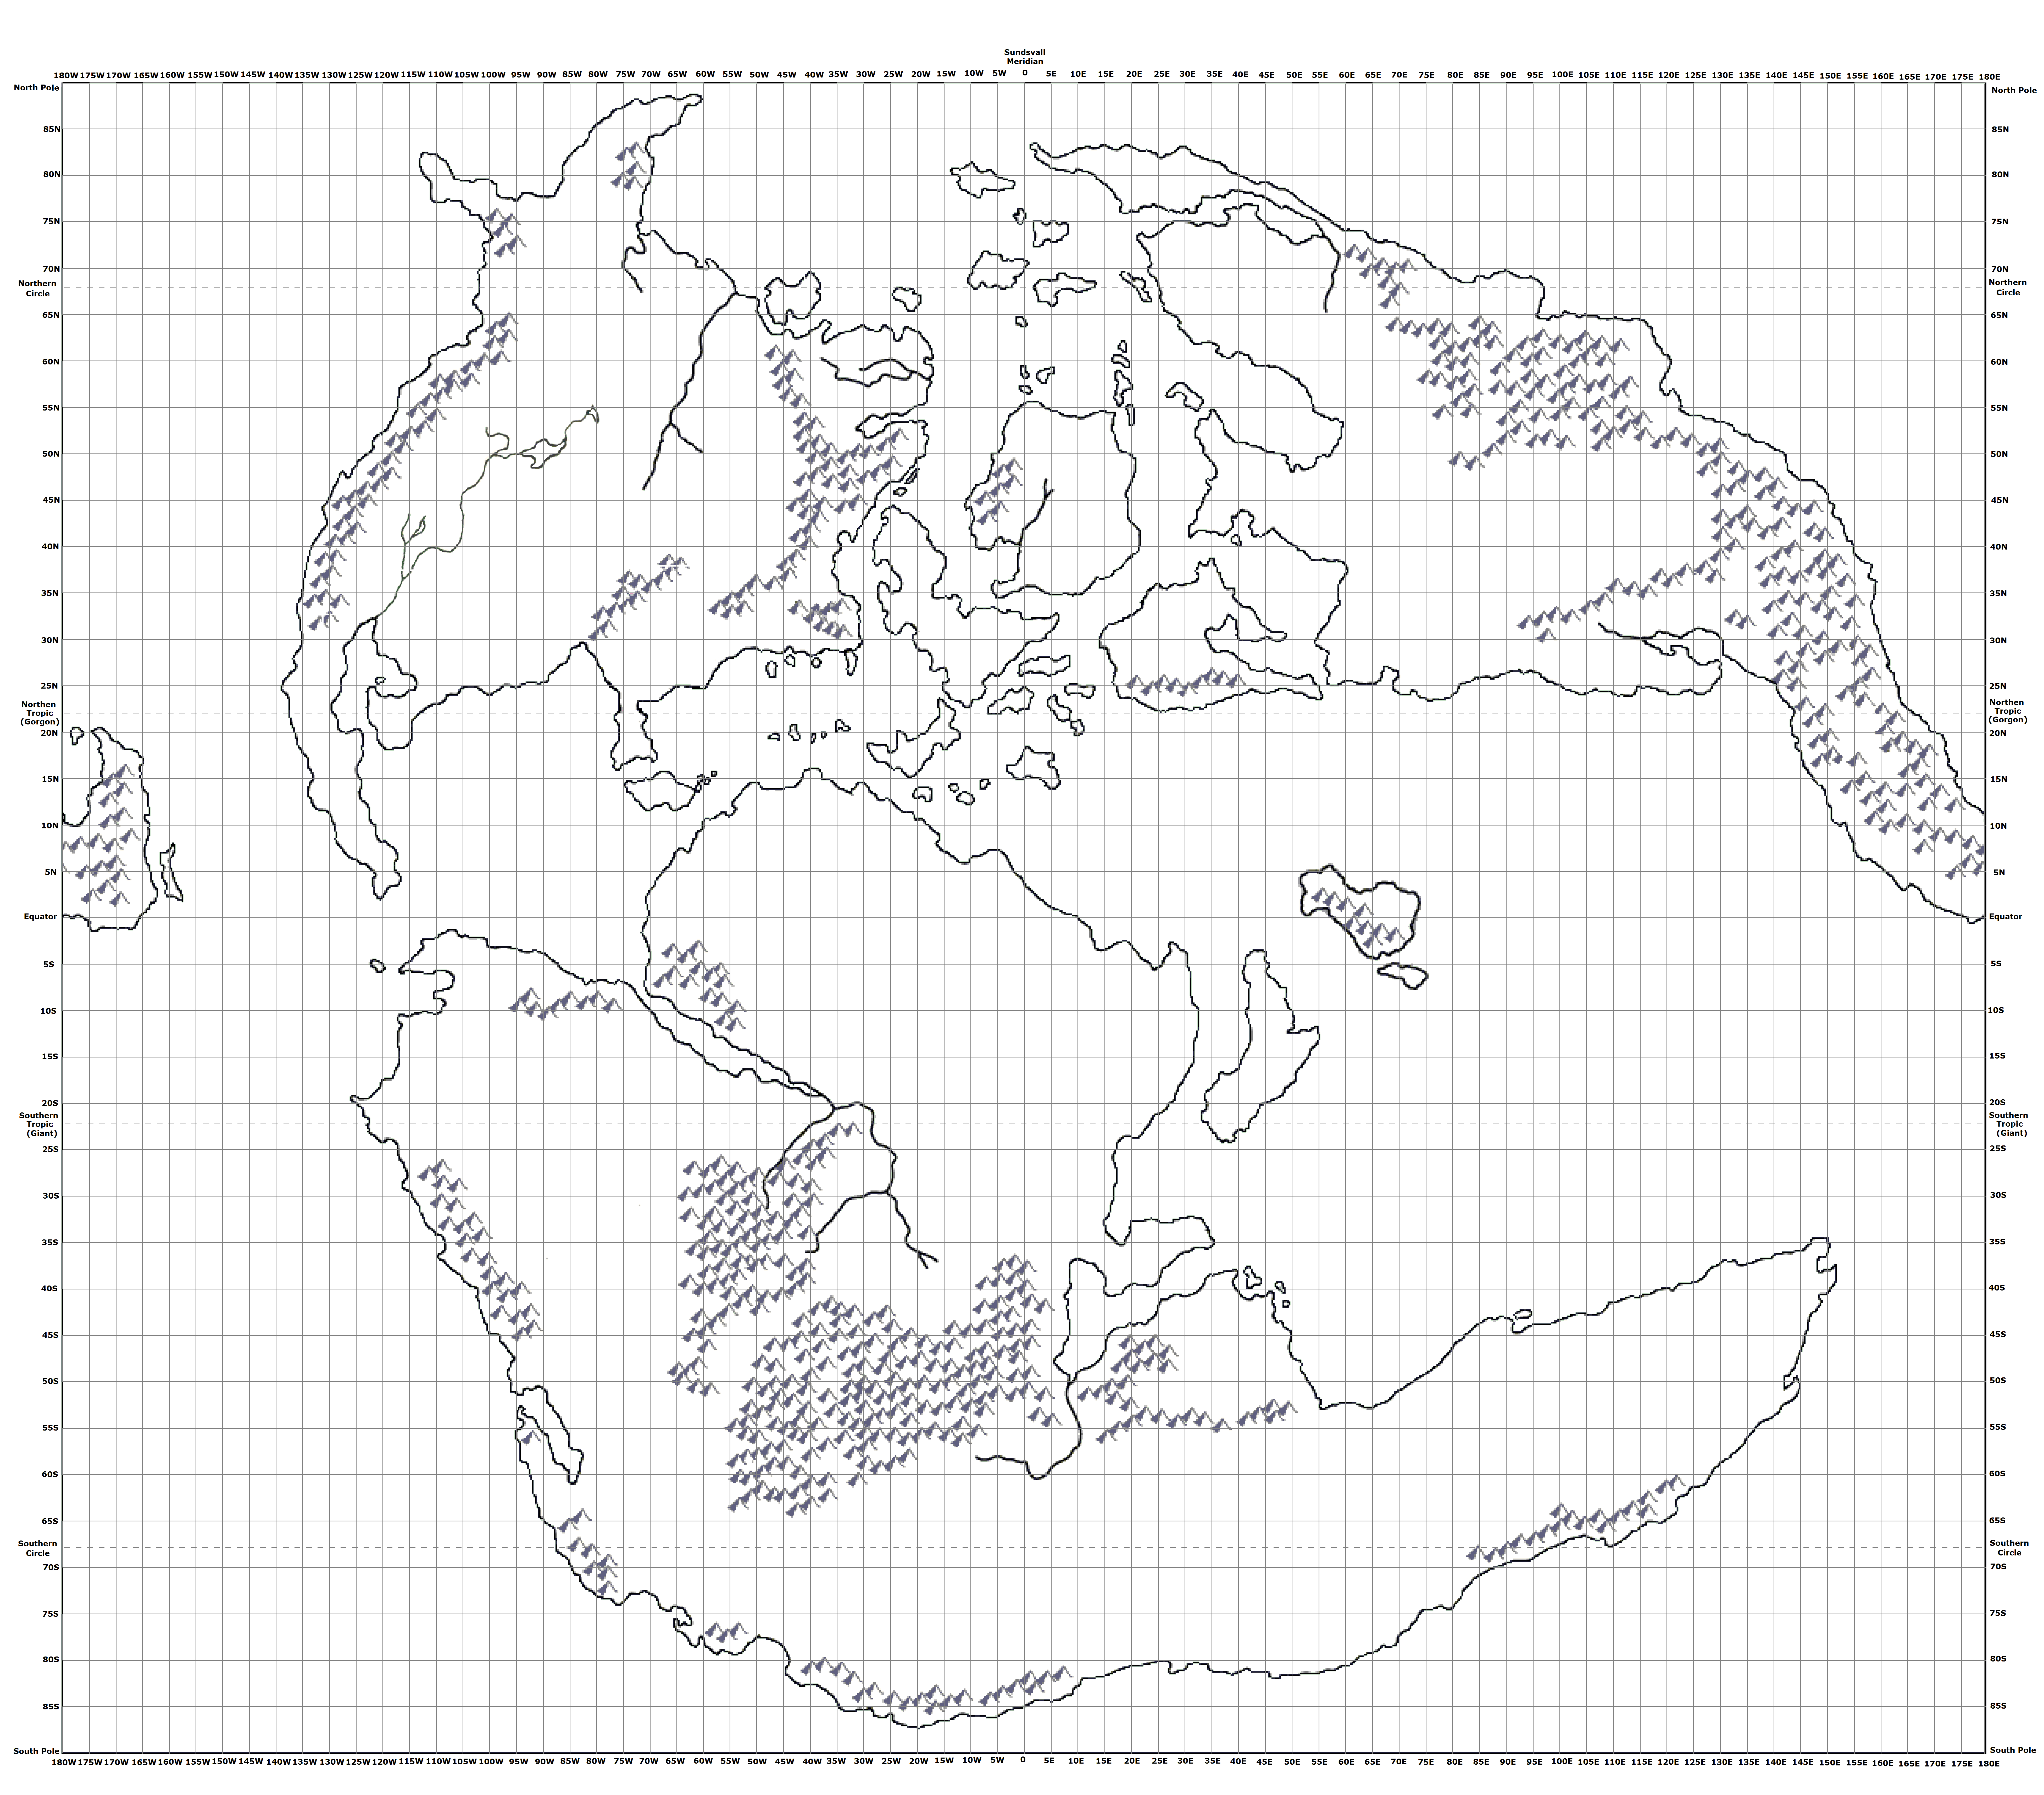 Mystaran maps outer world map with latitude and longitude gumiabroncs Images